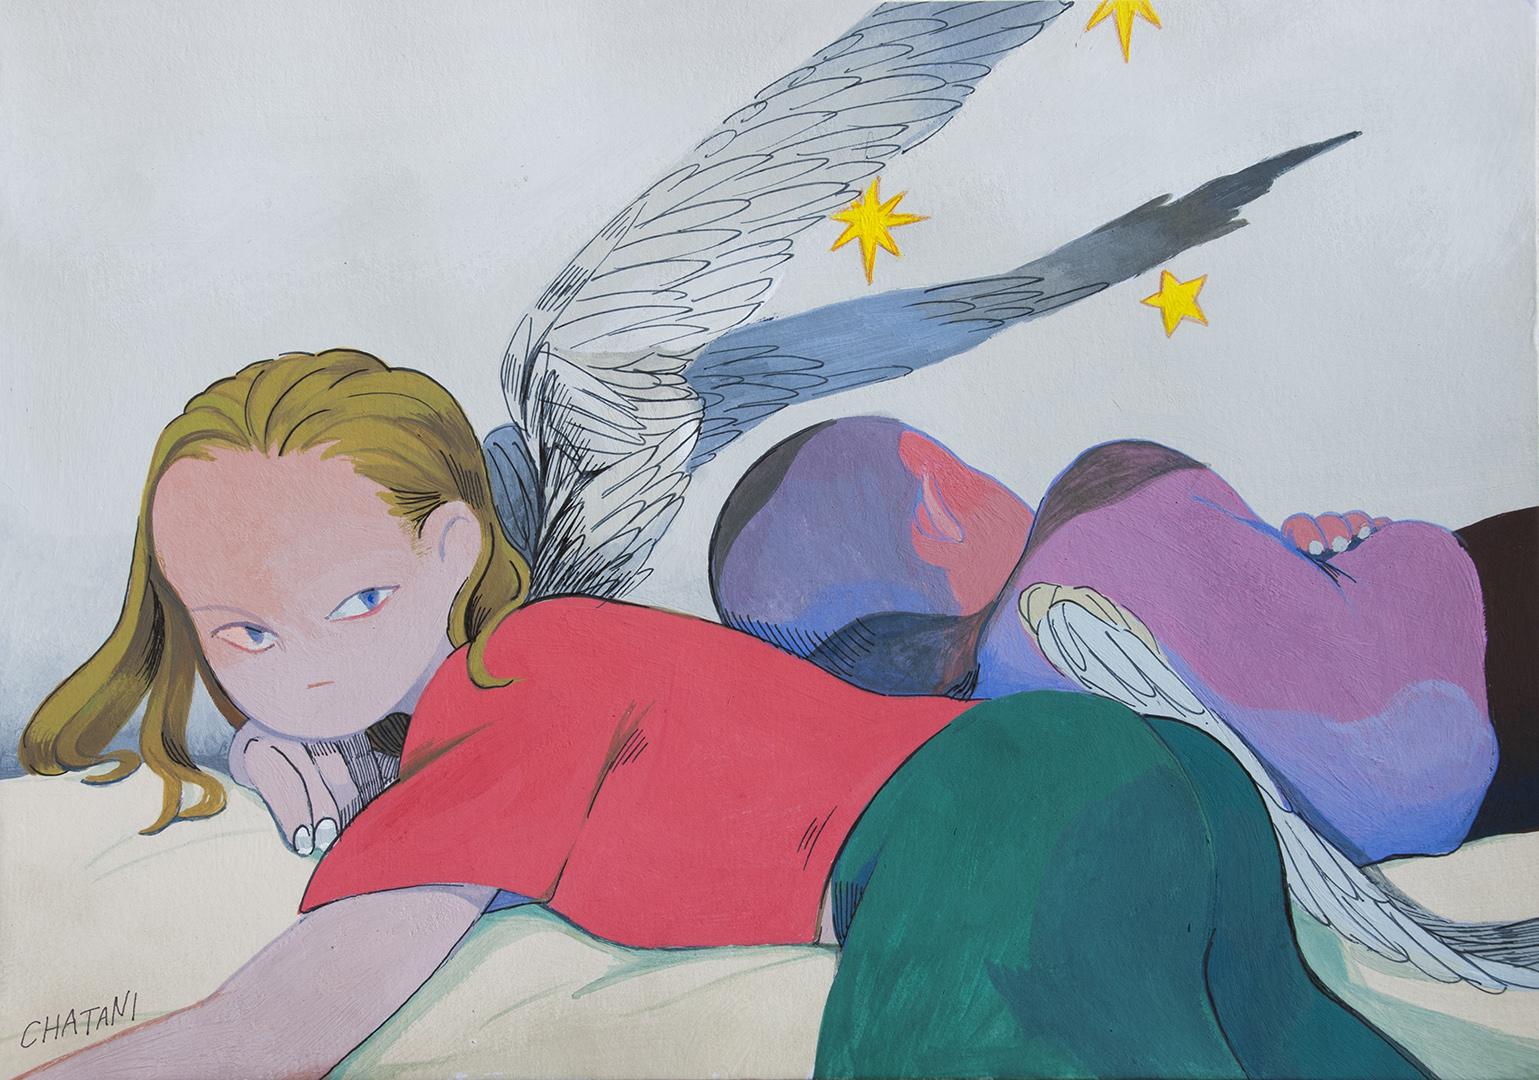 GirlsclubAsia-Artist-Hana Chatani-image 07